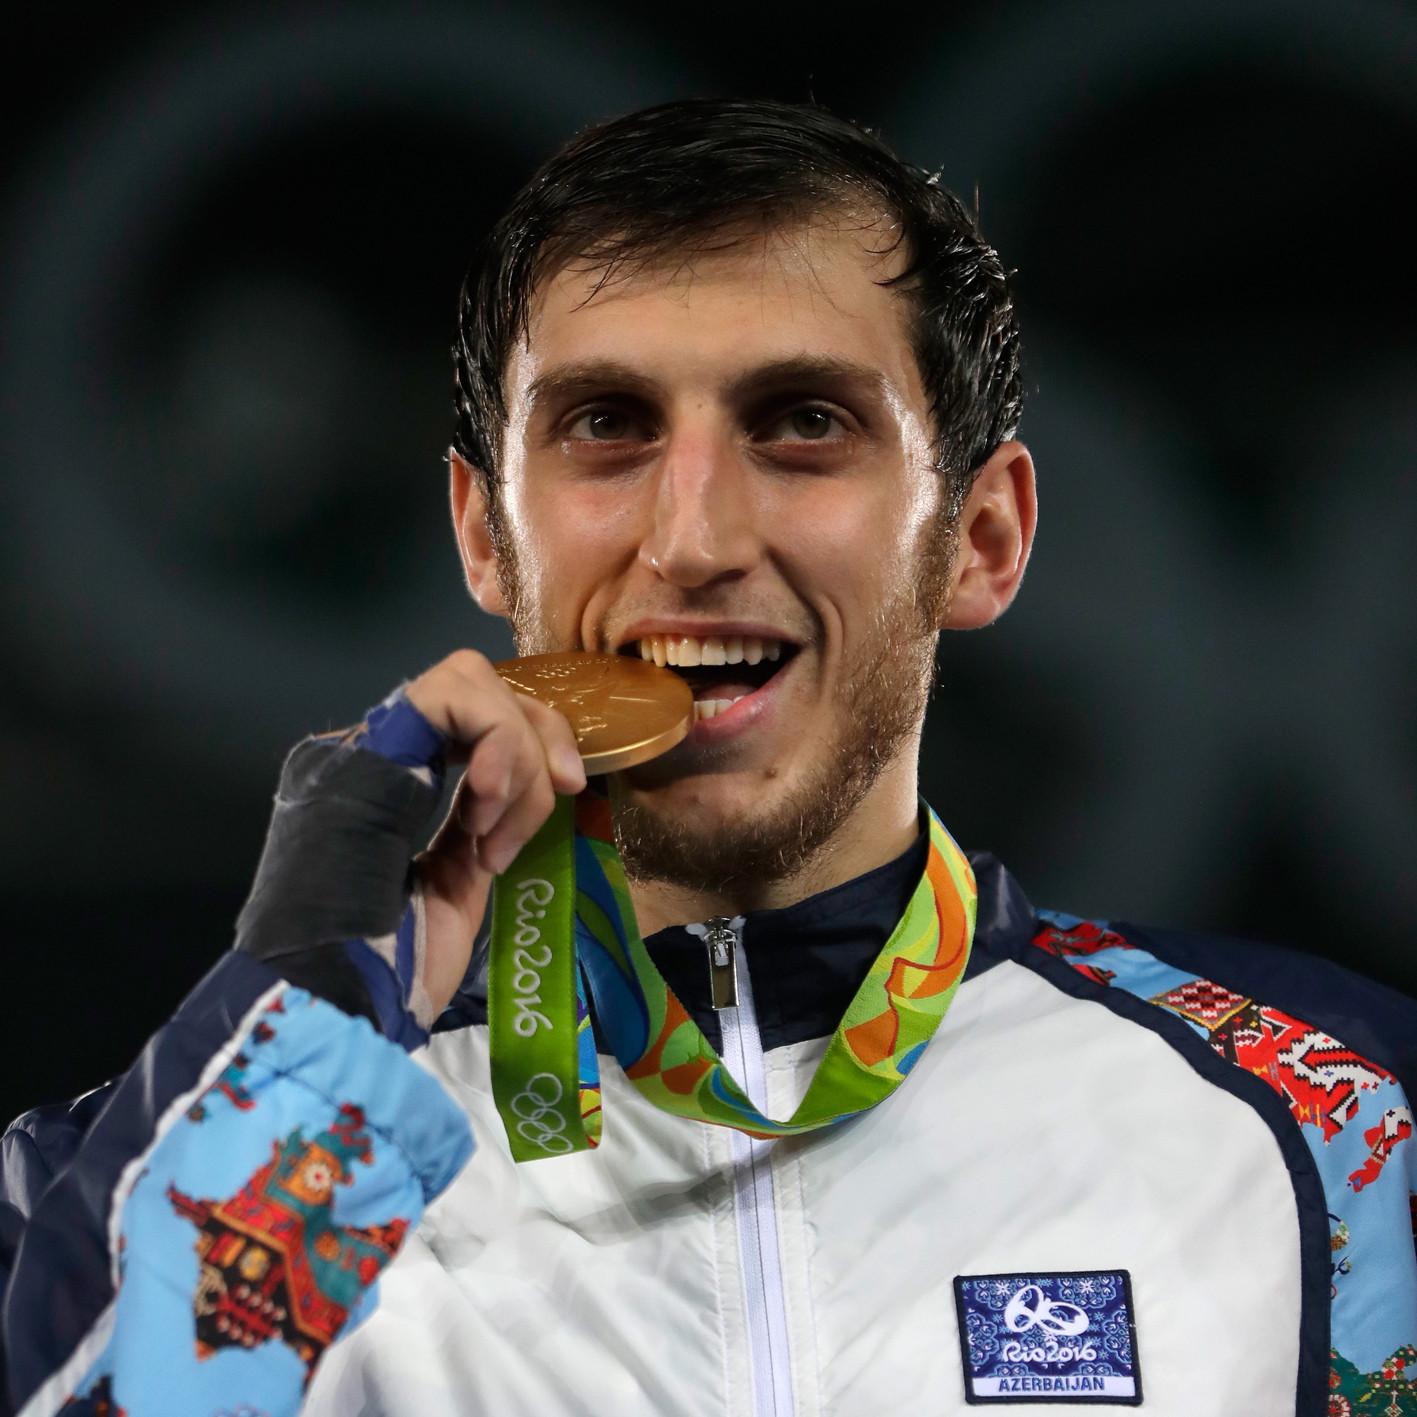 Radik Isayev – Azerbaijan's adopted champion